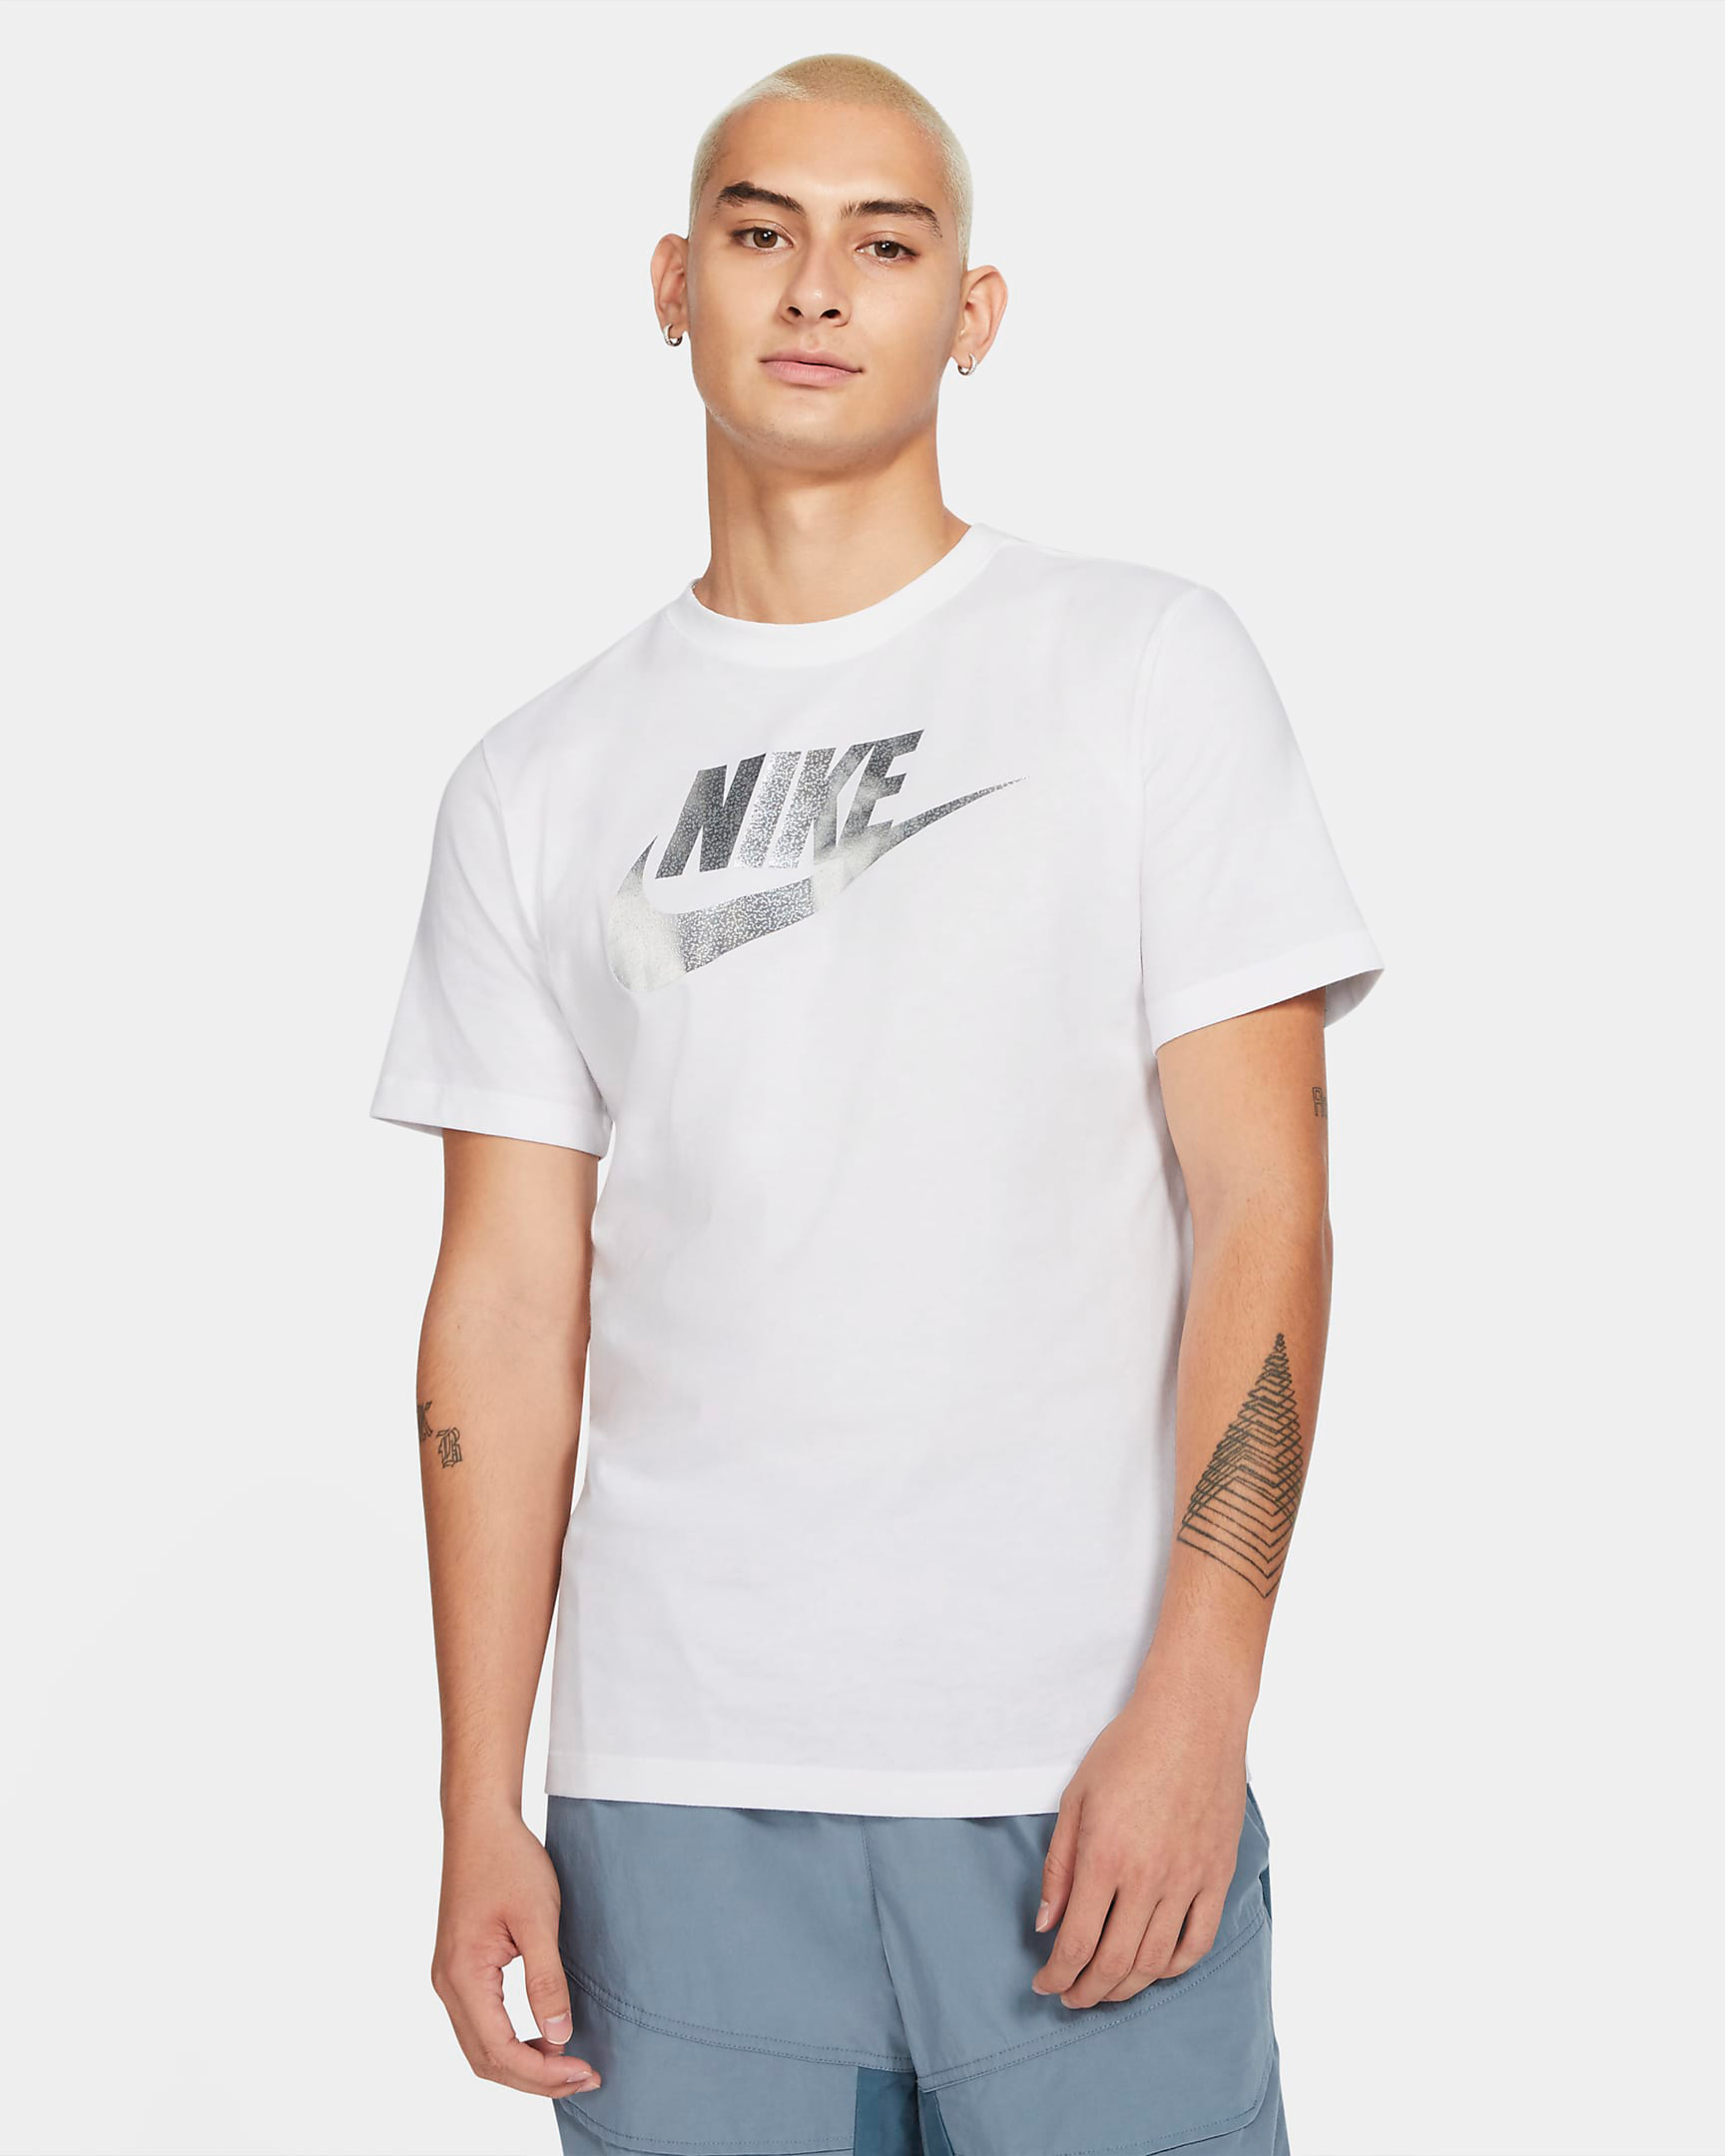 nike-sportswear-metallic-silver-shirt-white-2